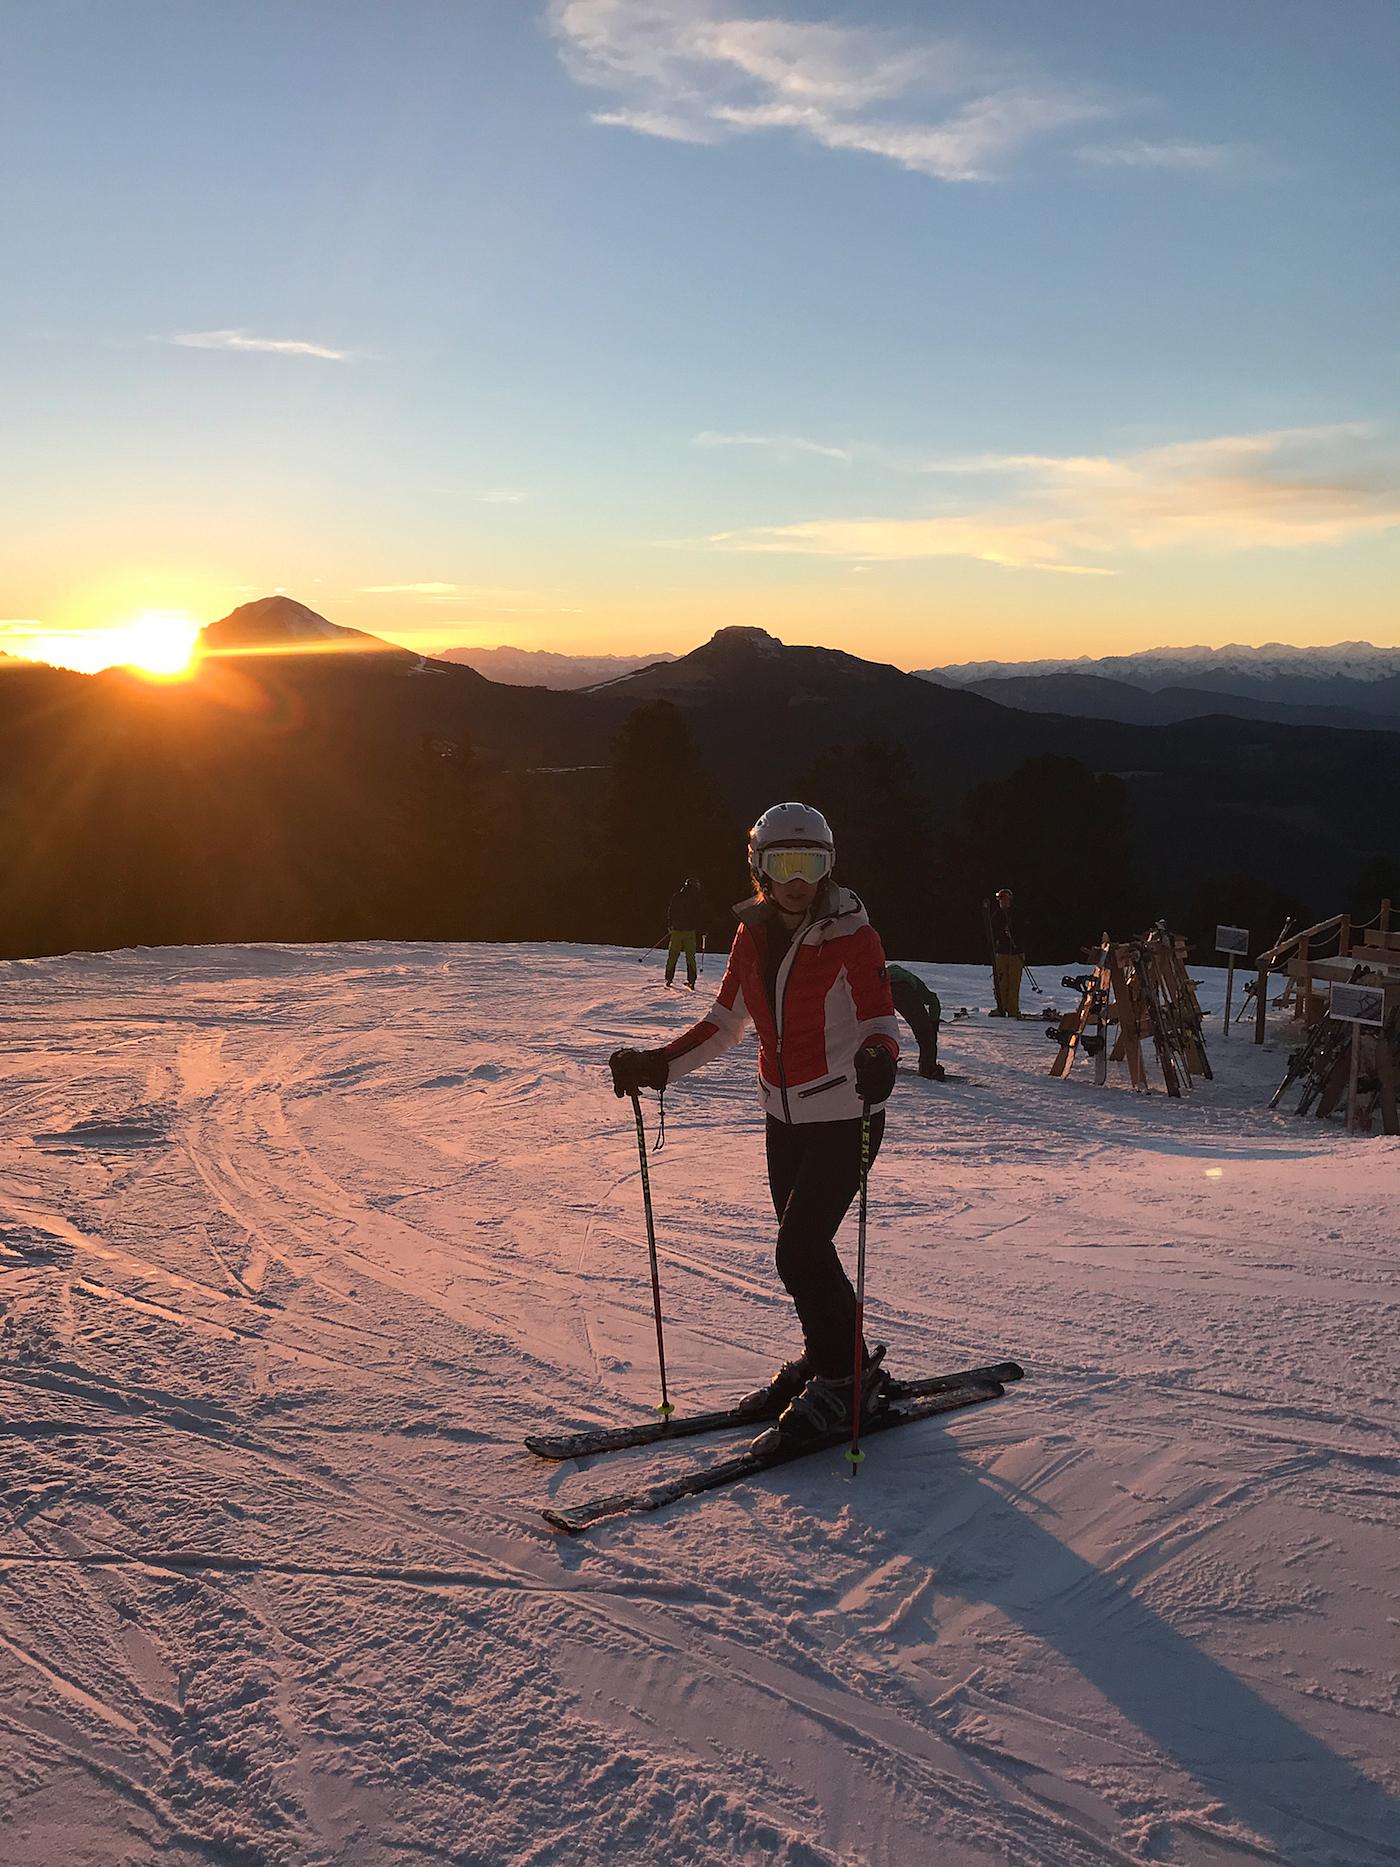 skiwoche südtirol _ winterholidays south tyrol - winterferien südtirol, obereggen, skifahren obereggen, skicenter latemar pampeago _ mayerl alm